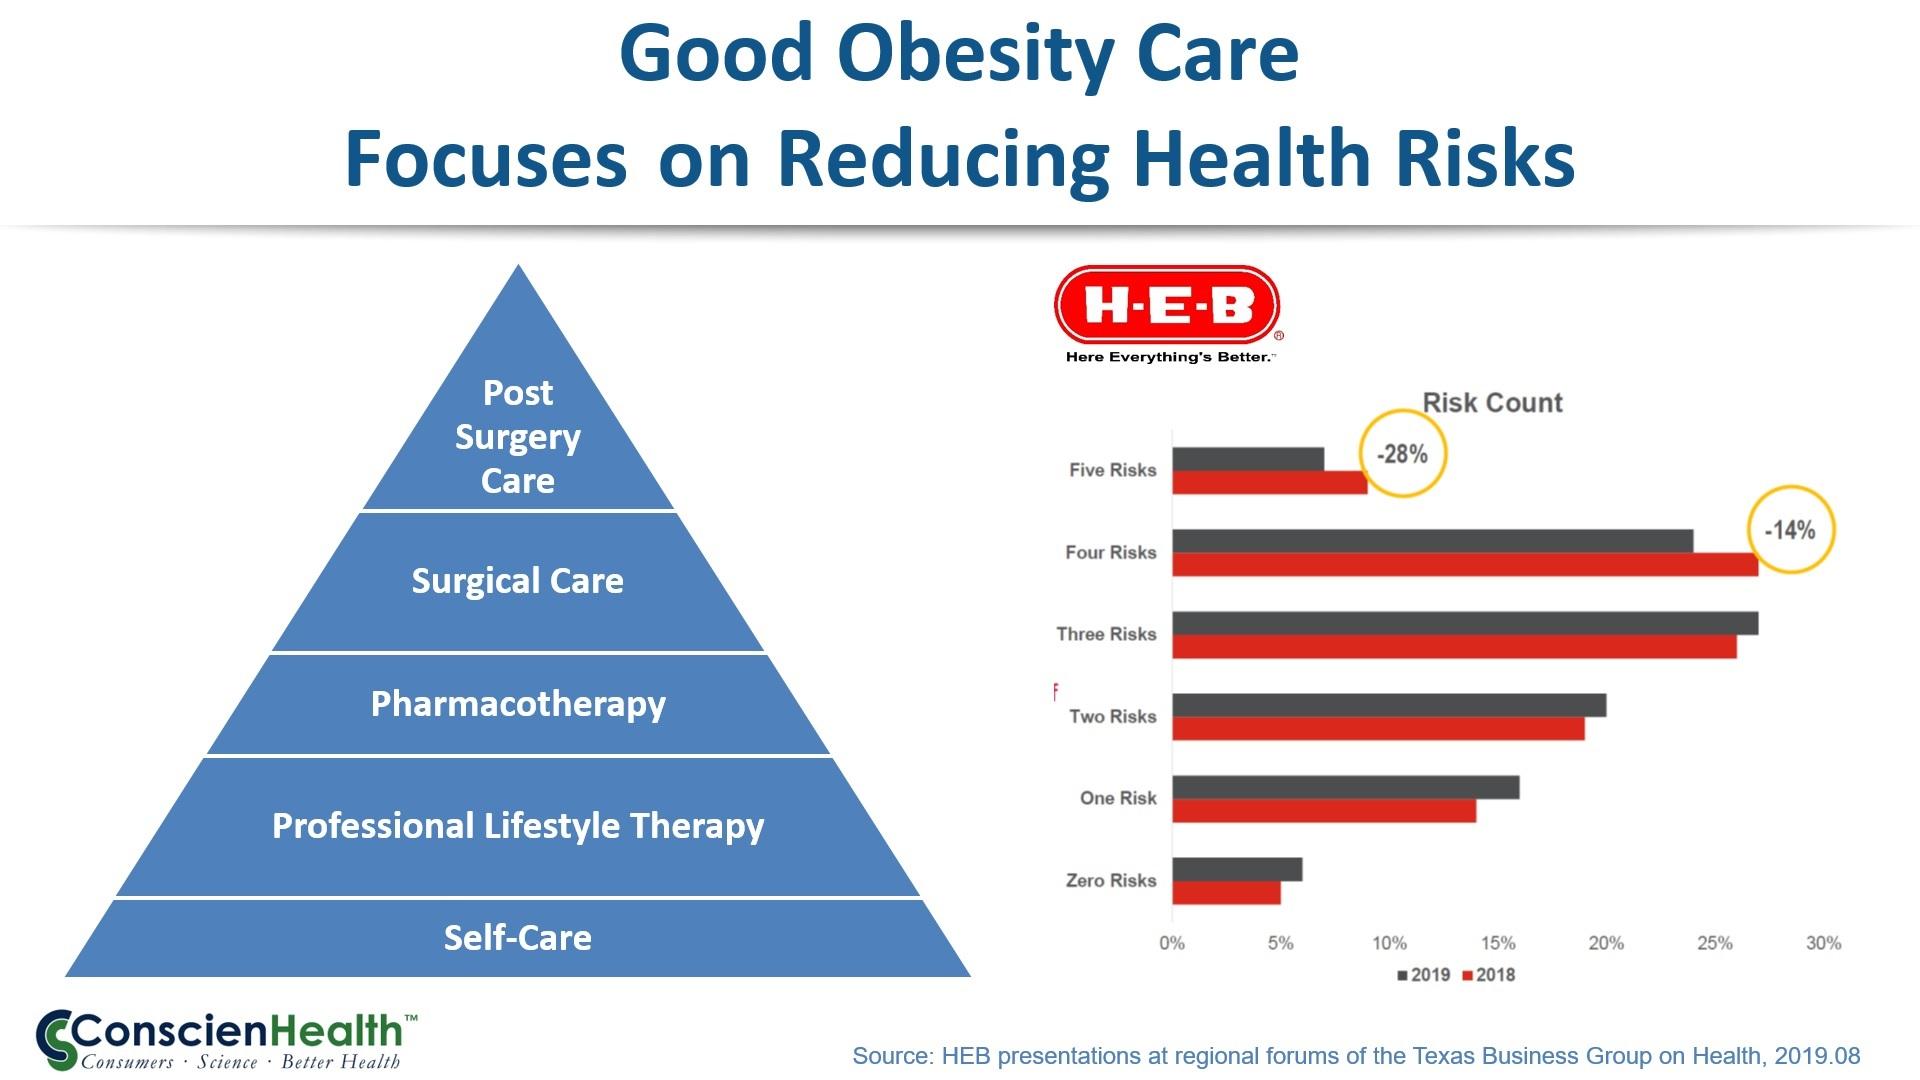 Good Obesity Care